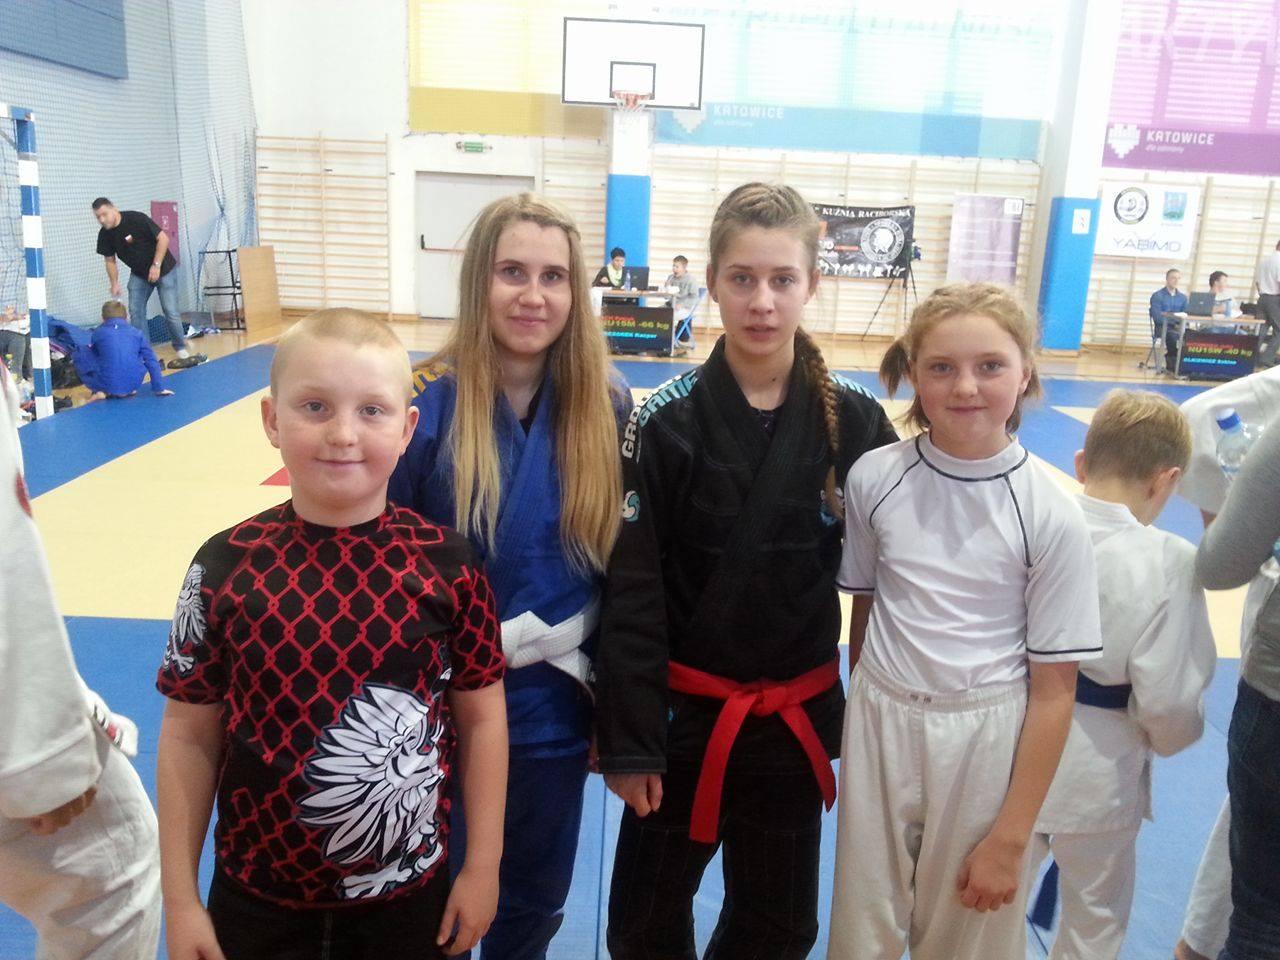 Fight Club Knurów BJJ